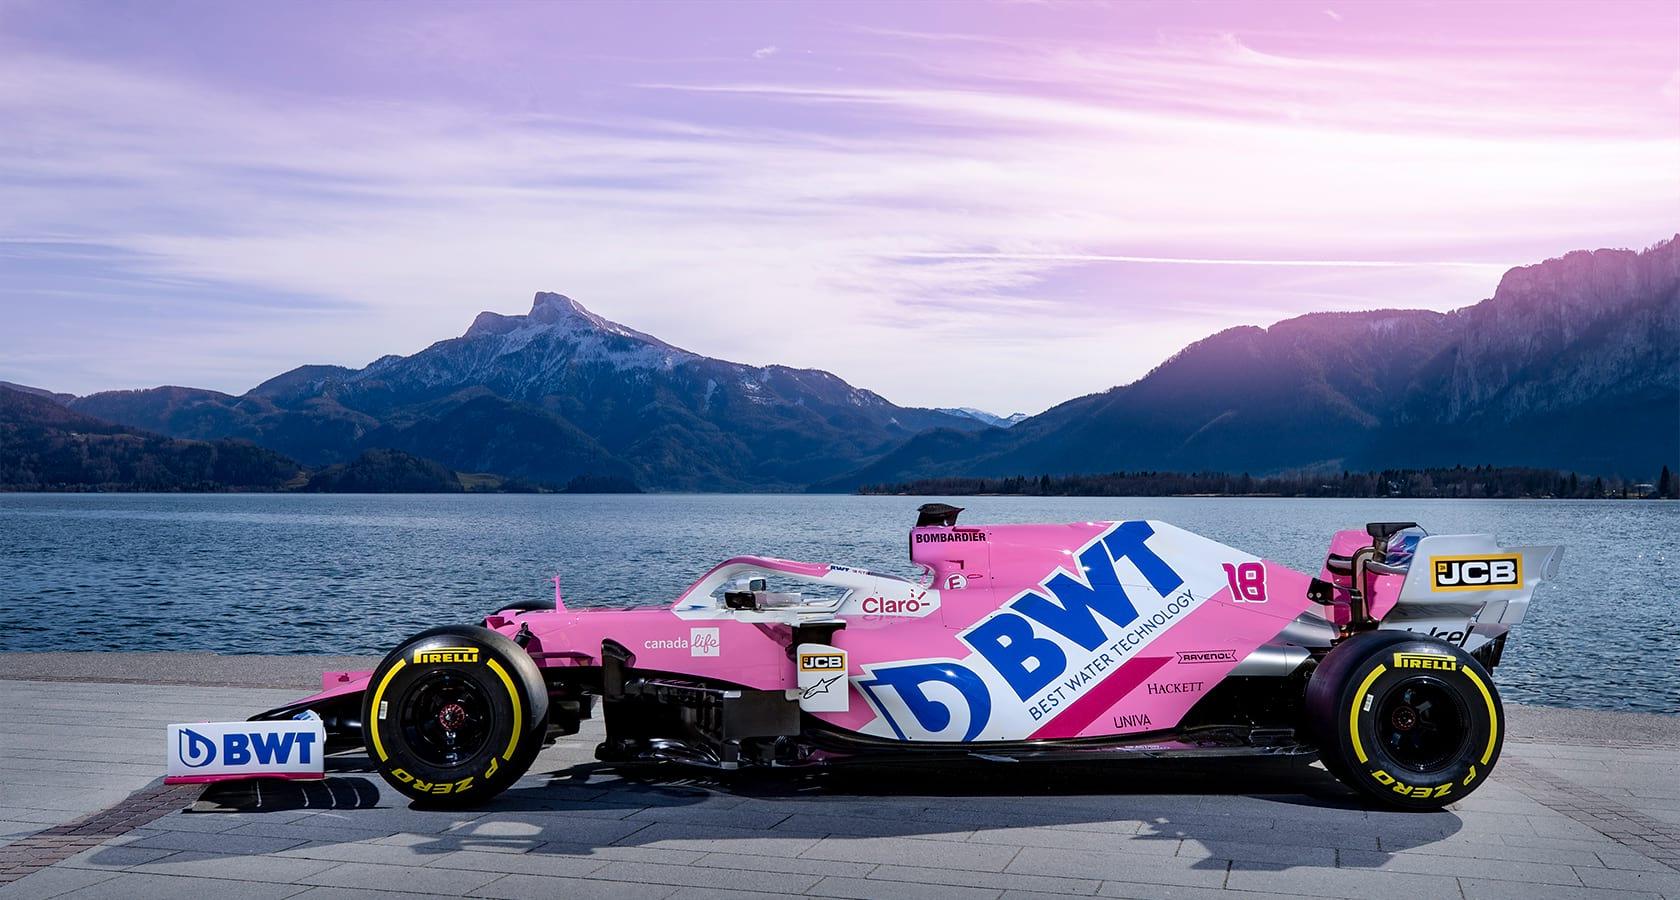 Formel 1 Bwt